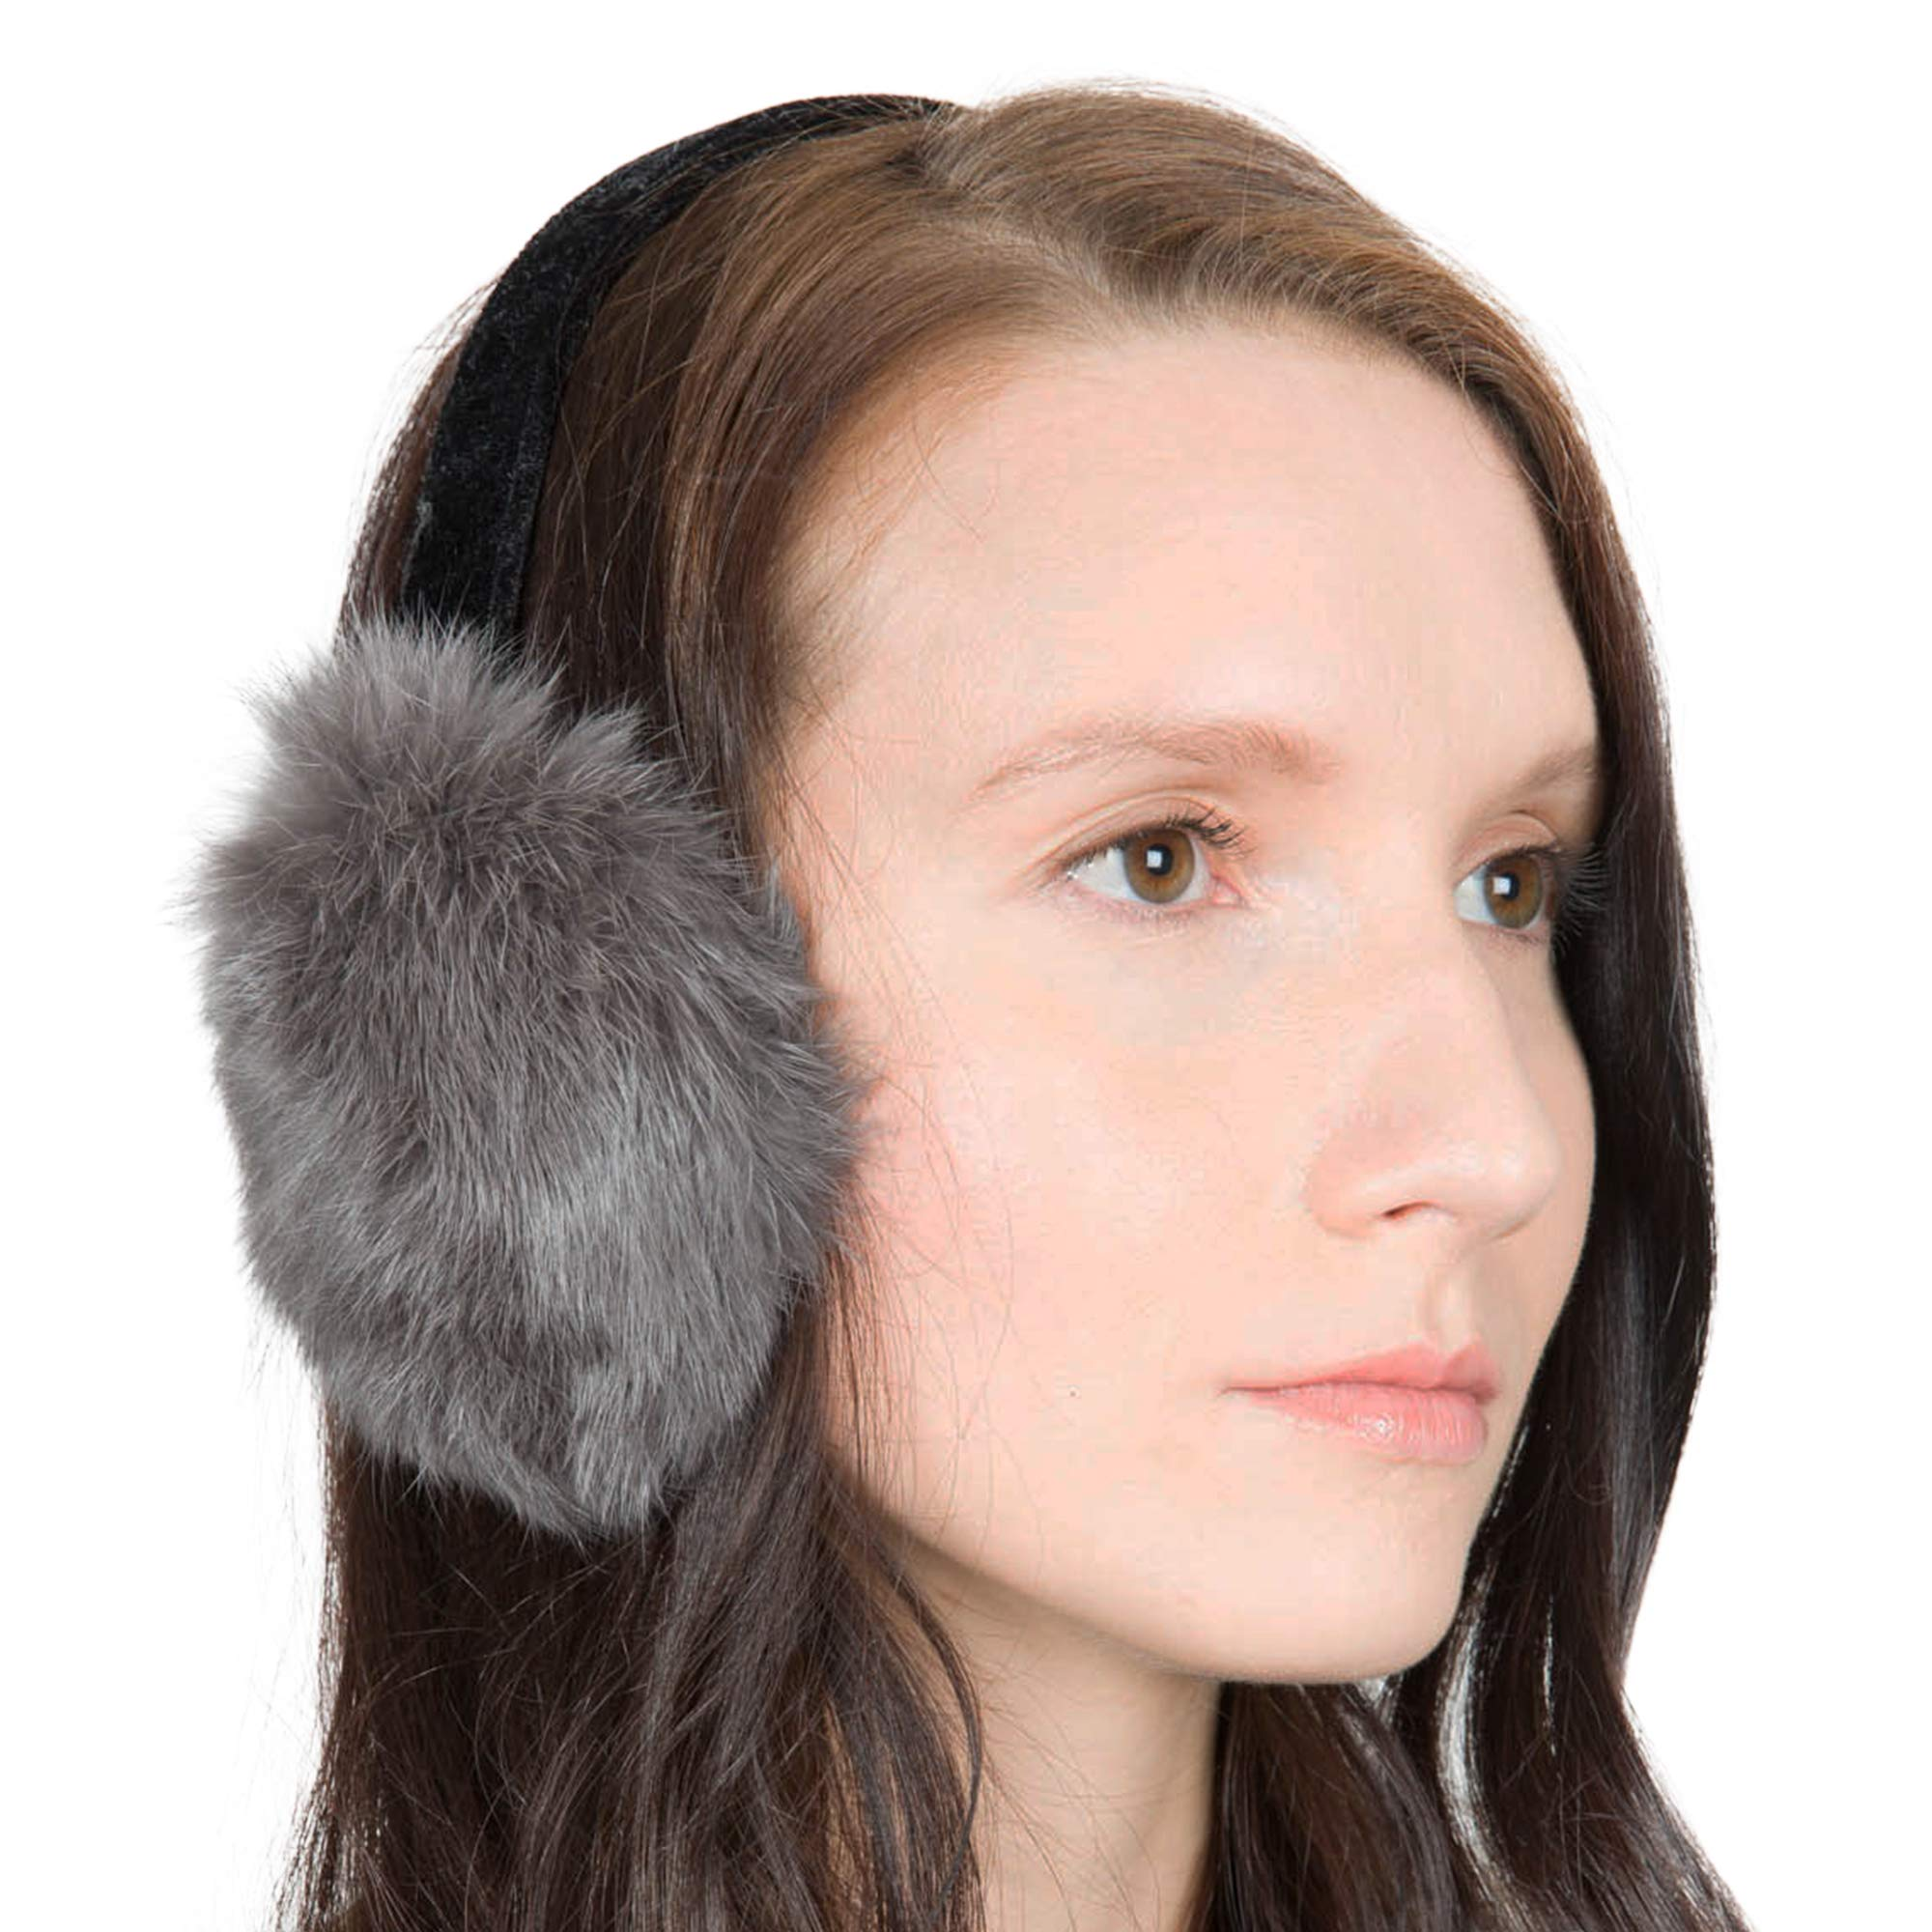 OBURLA Fur Earmuffs | Luxurious Real Fur Over Ear Warmers with Headband (Rabbit Fur, Gray)